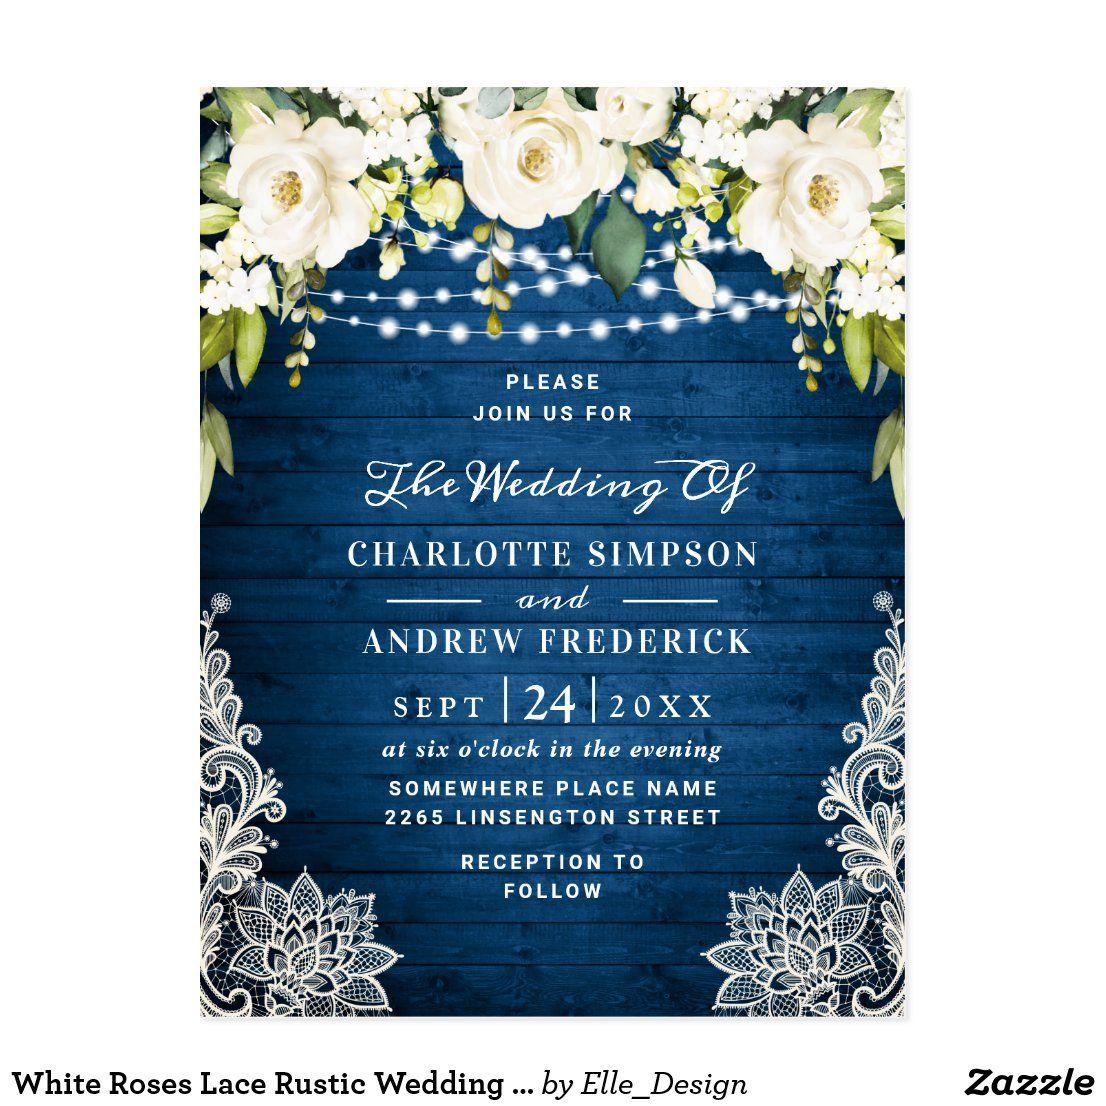 White Roses Lace Rustic Wedding Invitation Card #zazzle #zazzlemade  #customparty #partysupplies #custominvitation #invitations #customdecor #holidays #printondemand #customstationery #weddingstationery #wedding #bridalshower #invitationtemplate #partydecor #partydecorations #customgifts